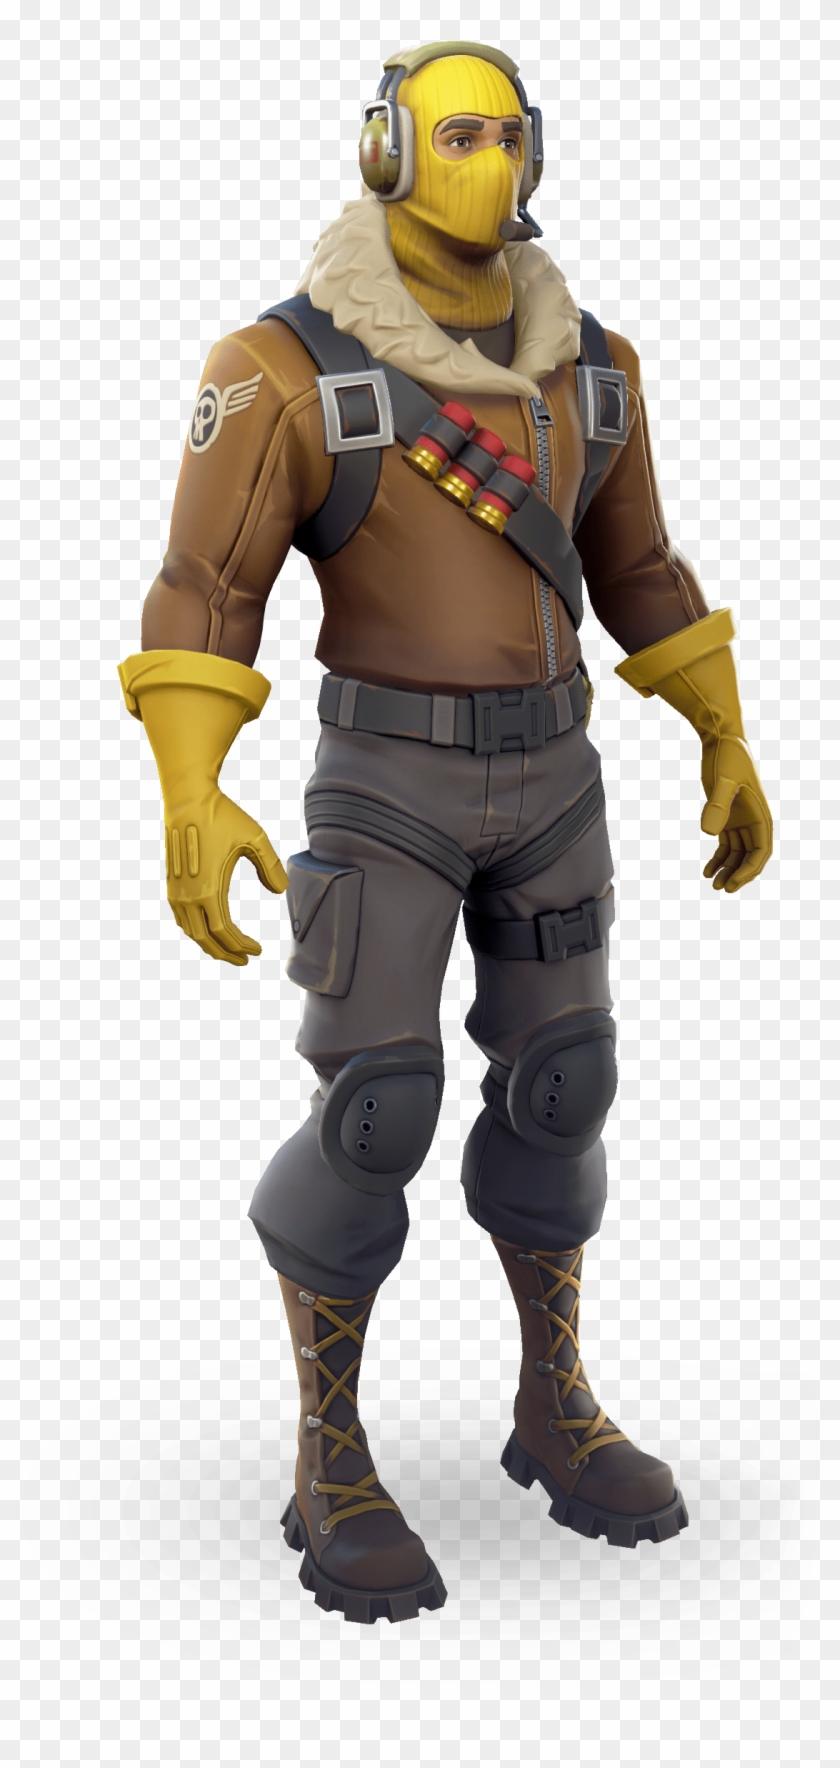 Image Result For Fortnite Characters Raptor Skin Fortnite Png Clipart 121333 Pikpng